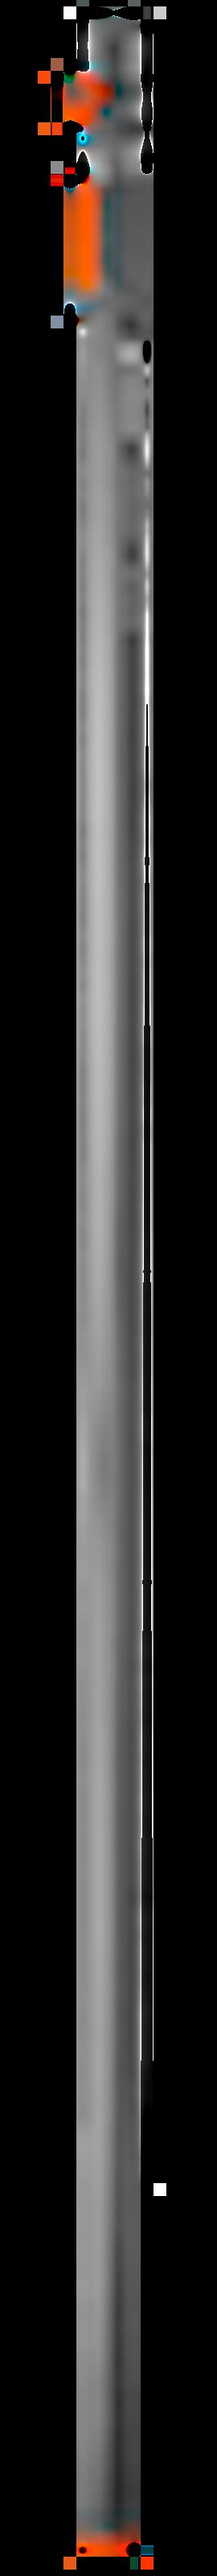 combisystem-teleskopskaft-210-390-cm-1